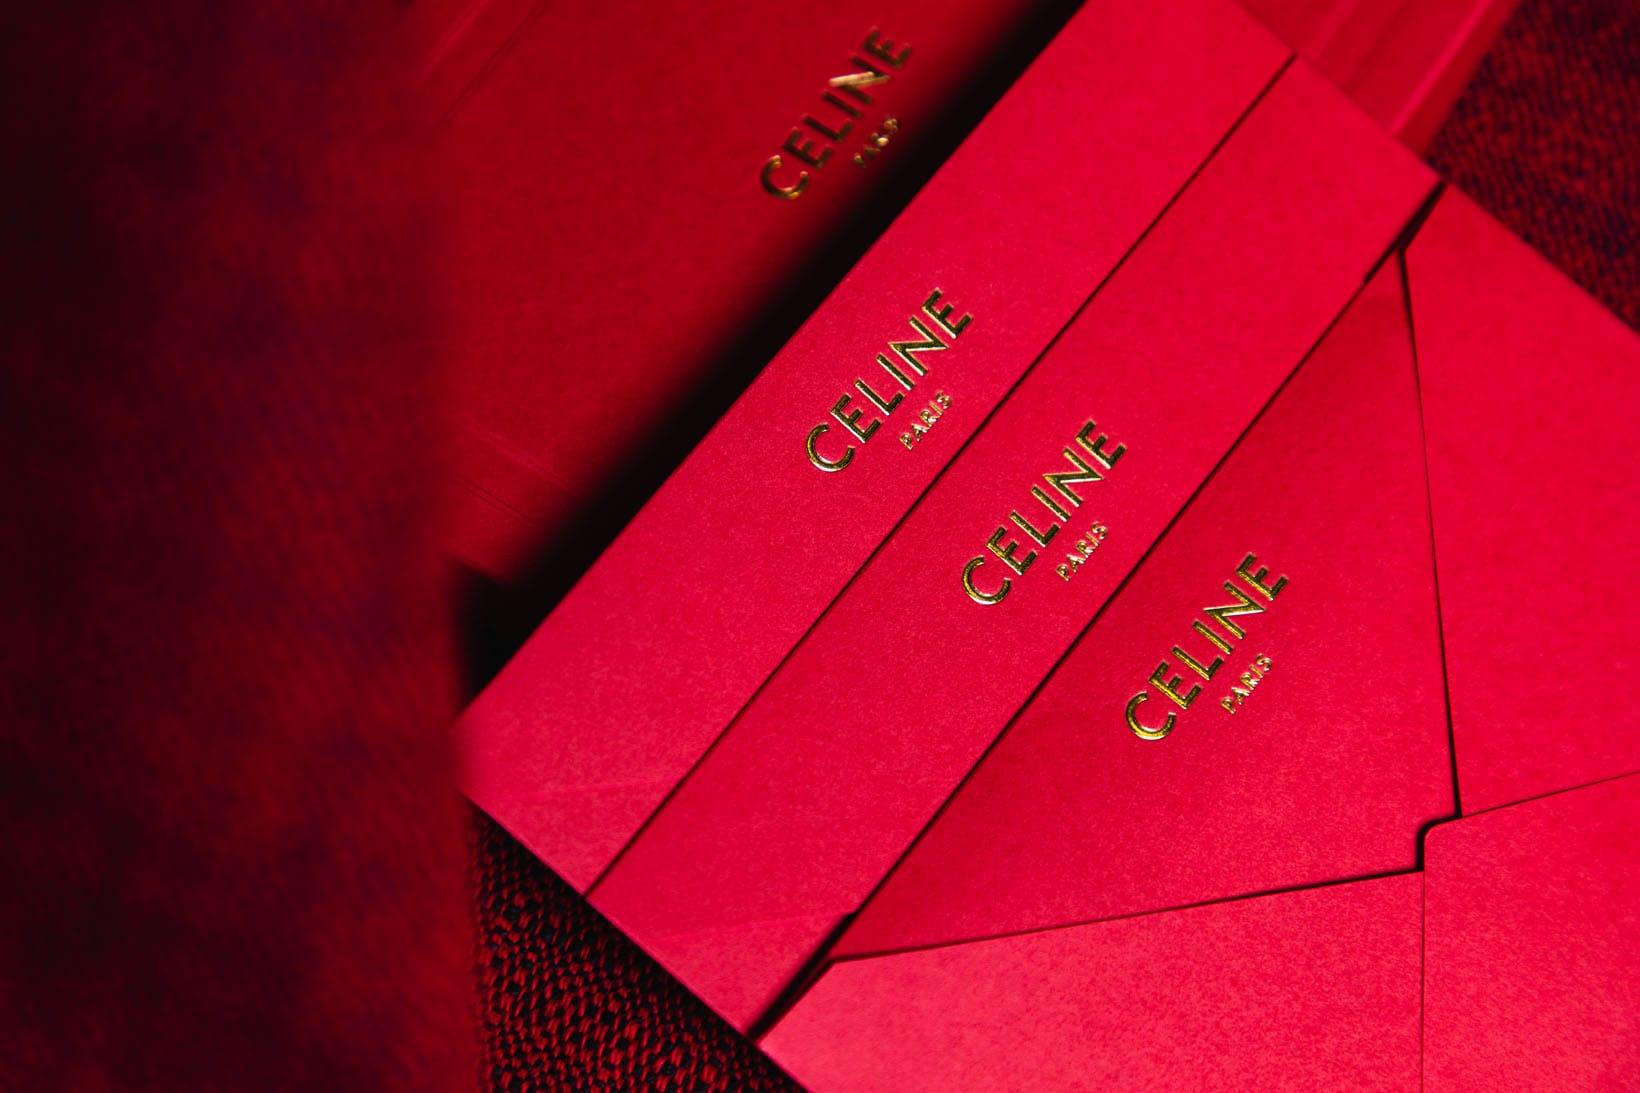 Lunar New Year Red Pockets Nike, Gucci, Celine